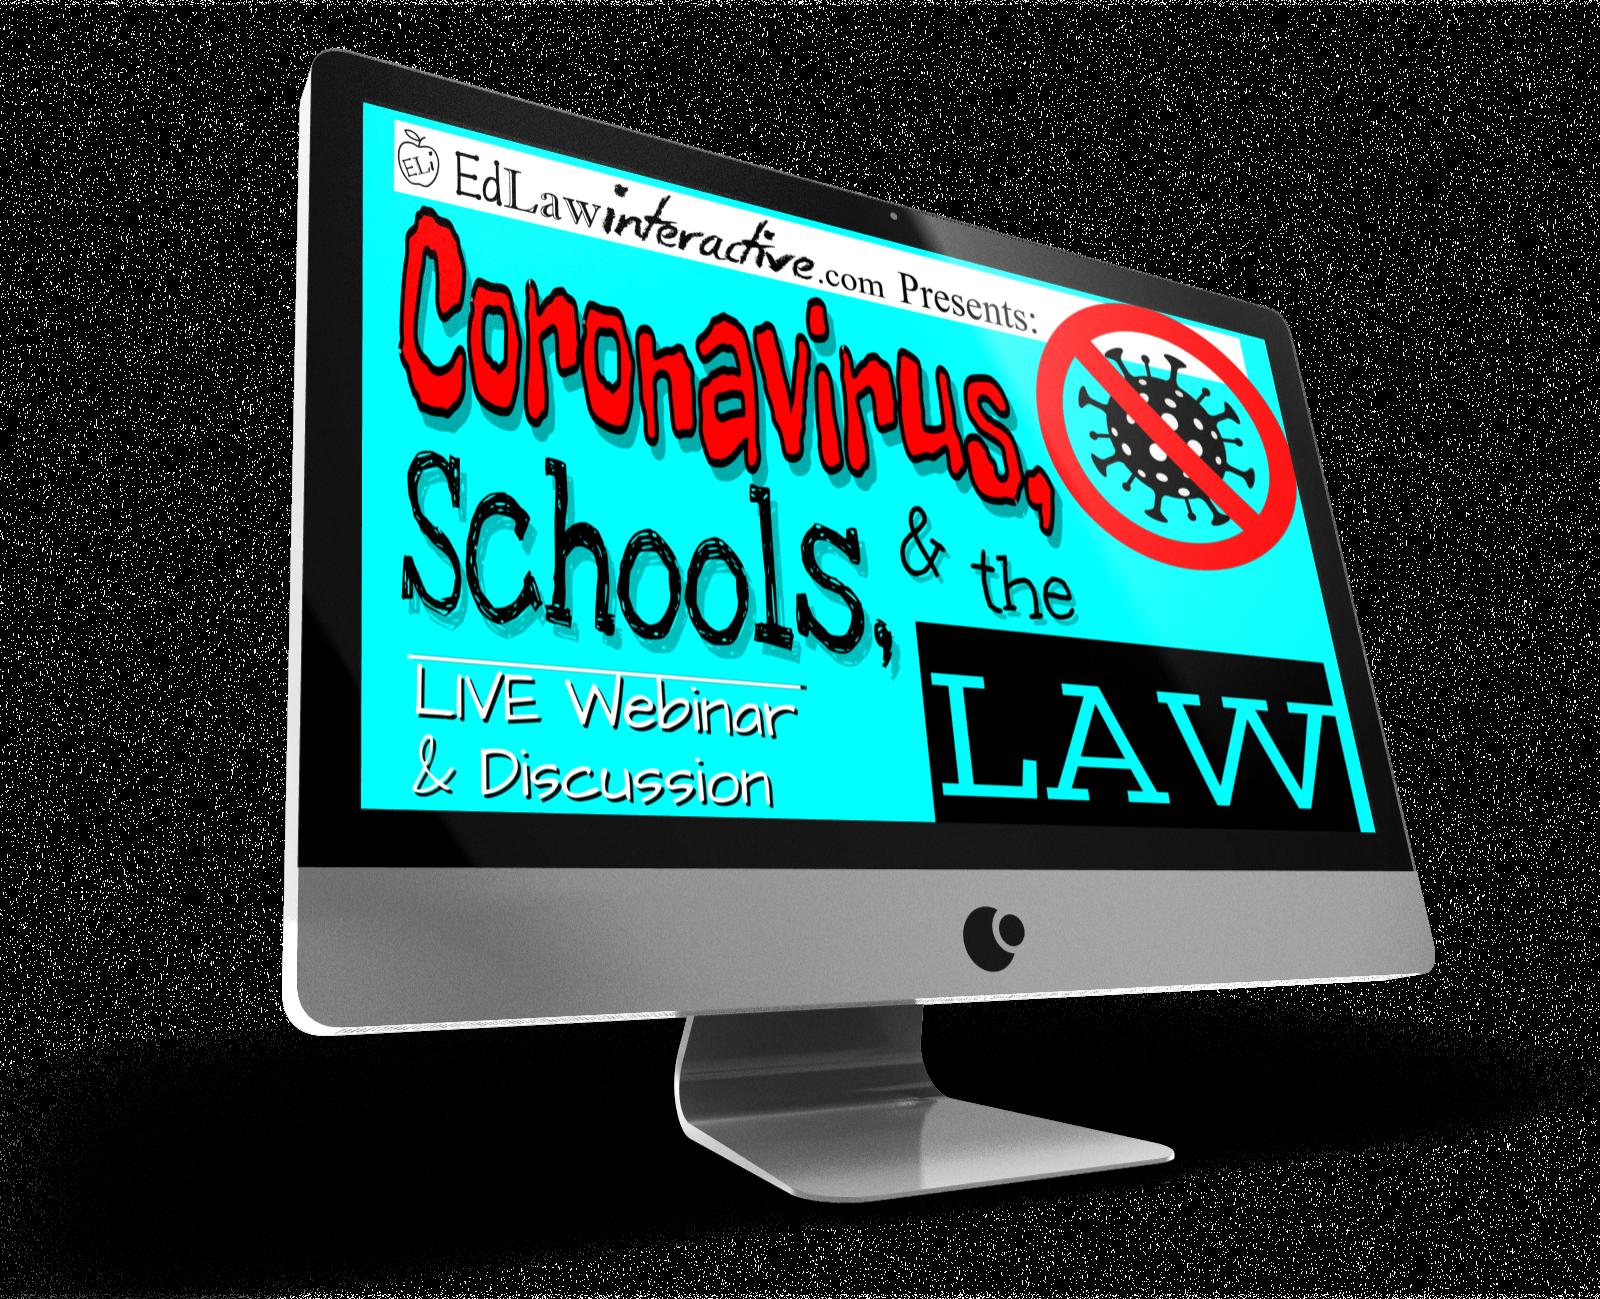 Coronavirus Schools and the Law WEBINAR